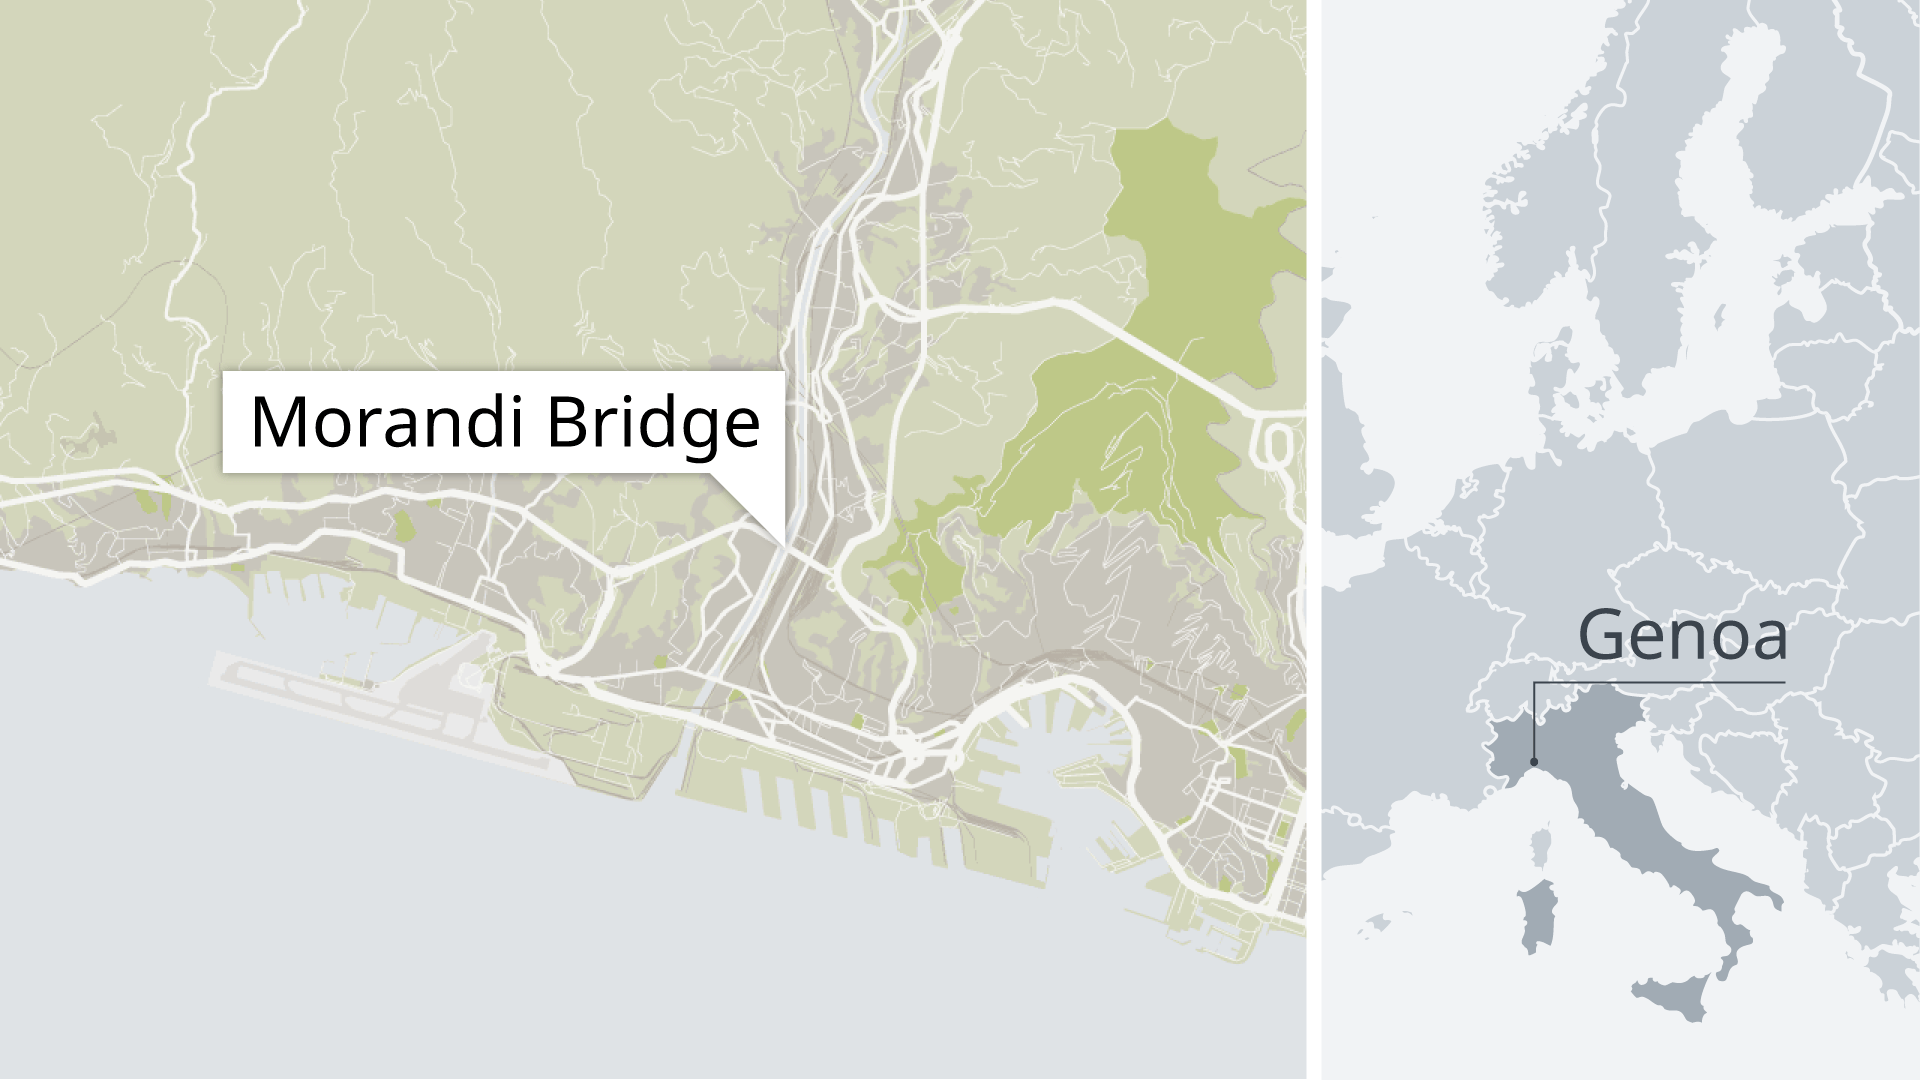 Karte Morandi Brücke, Genua, Italien EN